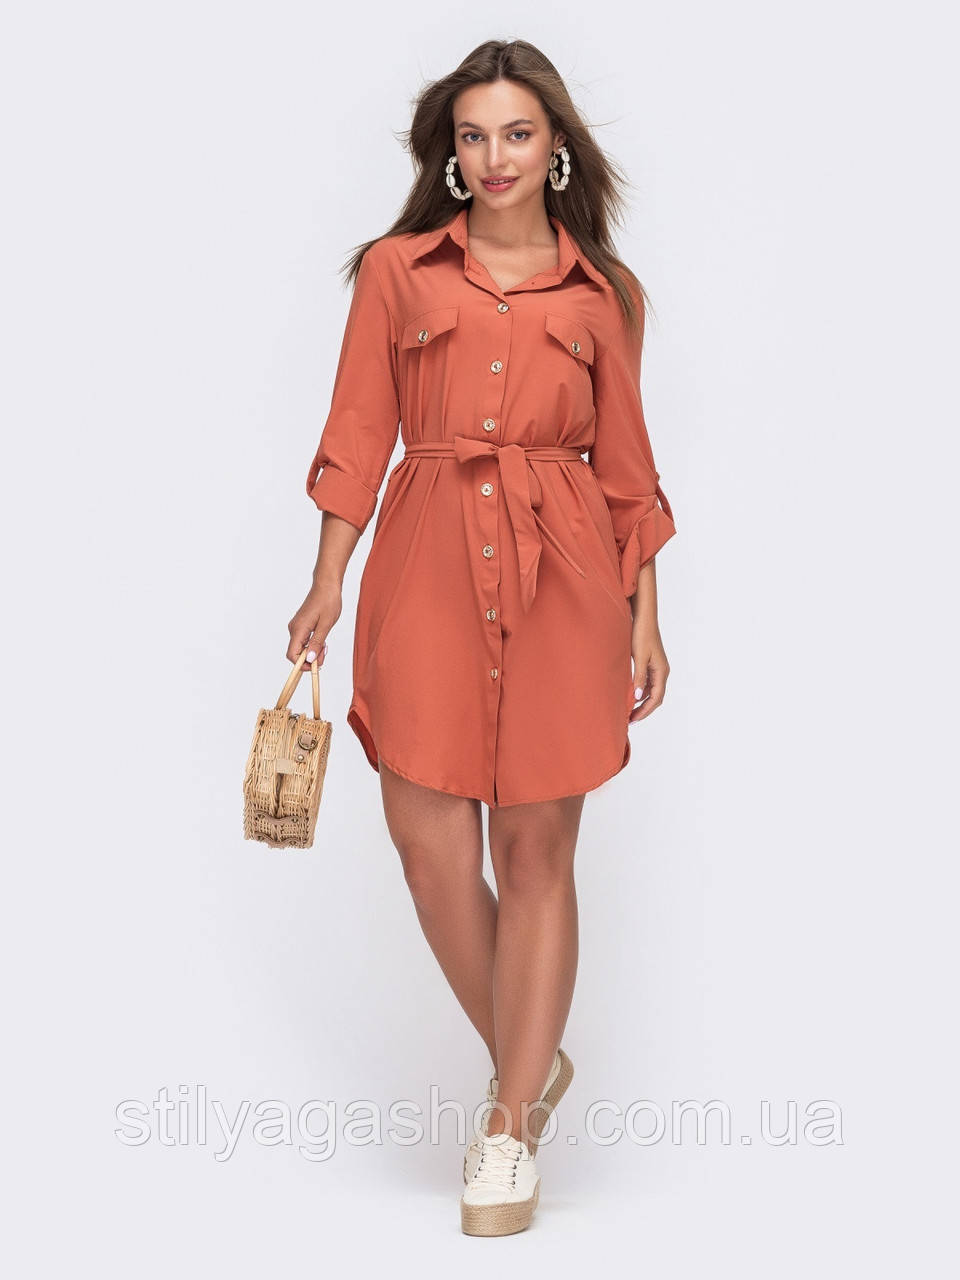 Платье-рубашка на застежке пуговицы и клапанами на лифе